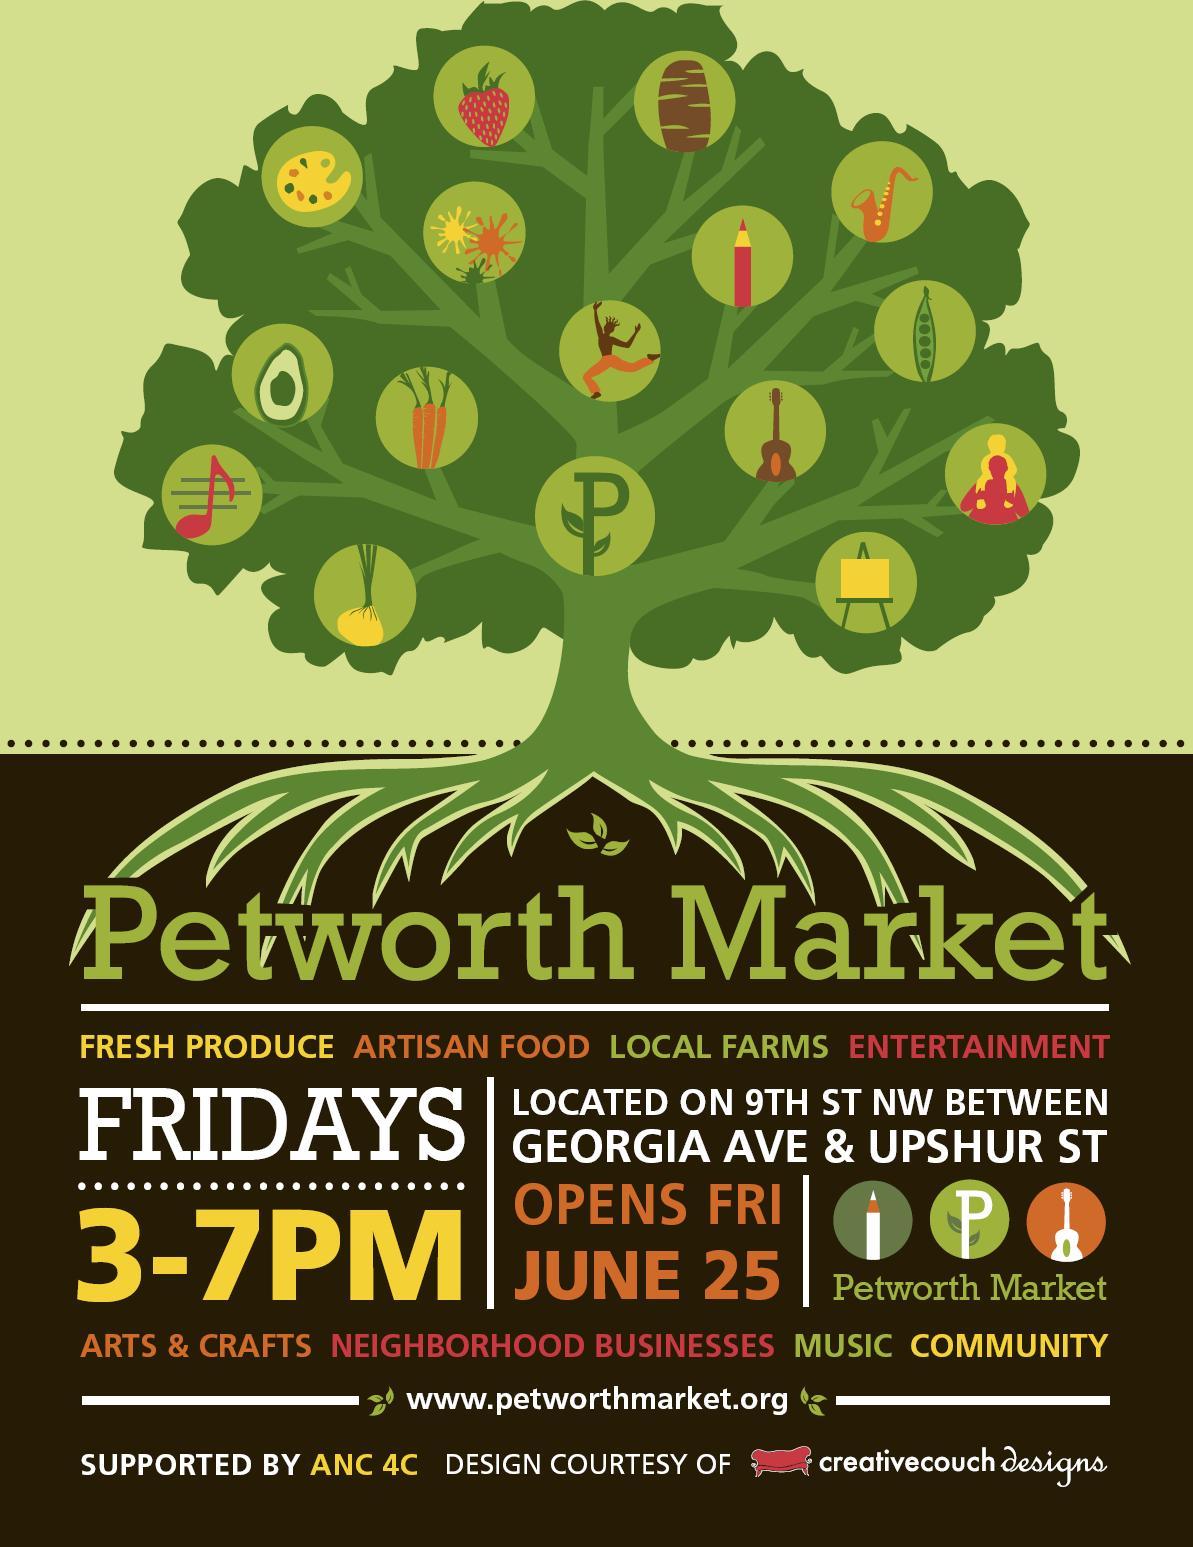 petworth community market set to open friday  june 25